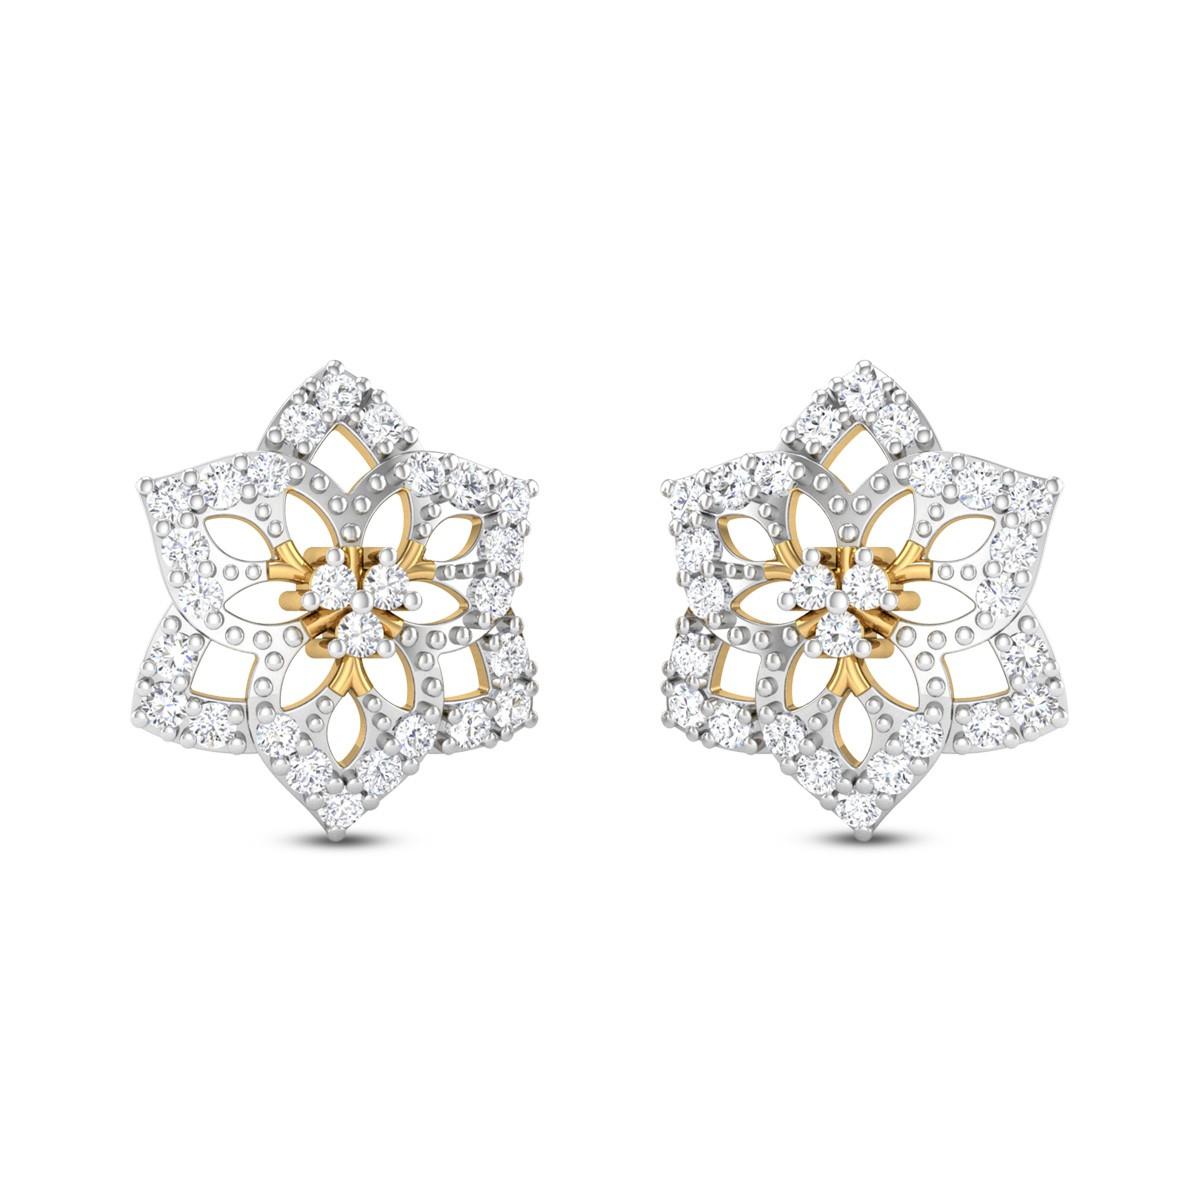 Shining Star Diamond Earrings